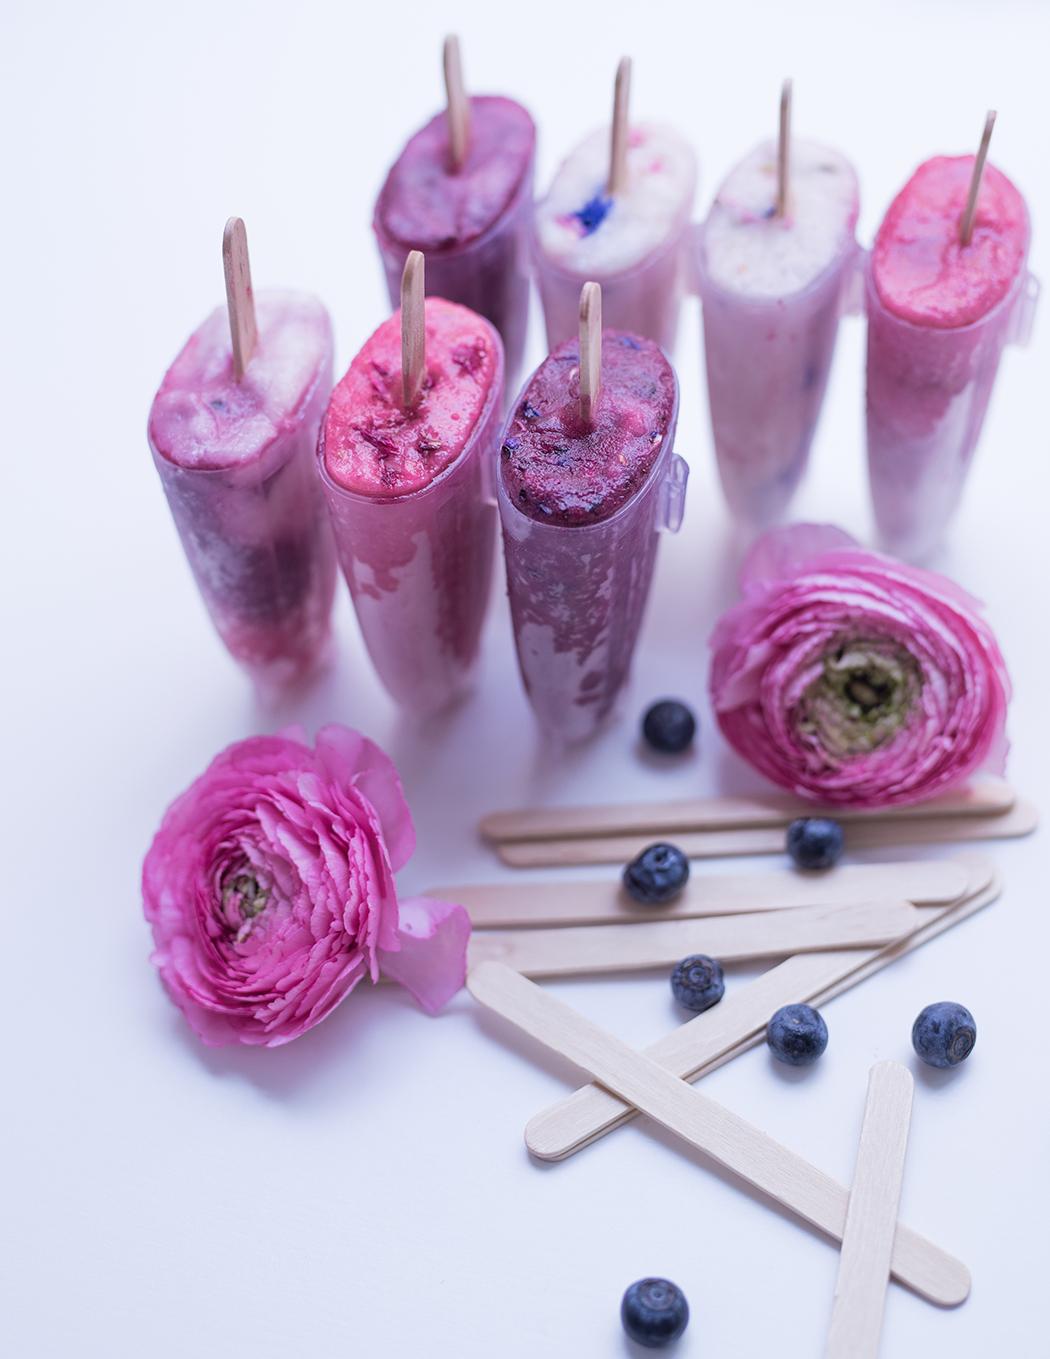 Foodblog-Foodblogger-Food-Blog-Blogger-Muenchen-Deutschland-Lindarella-Yoghurt-Eis-Kokoseis-selber-machen-7-wewb